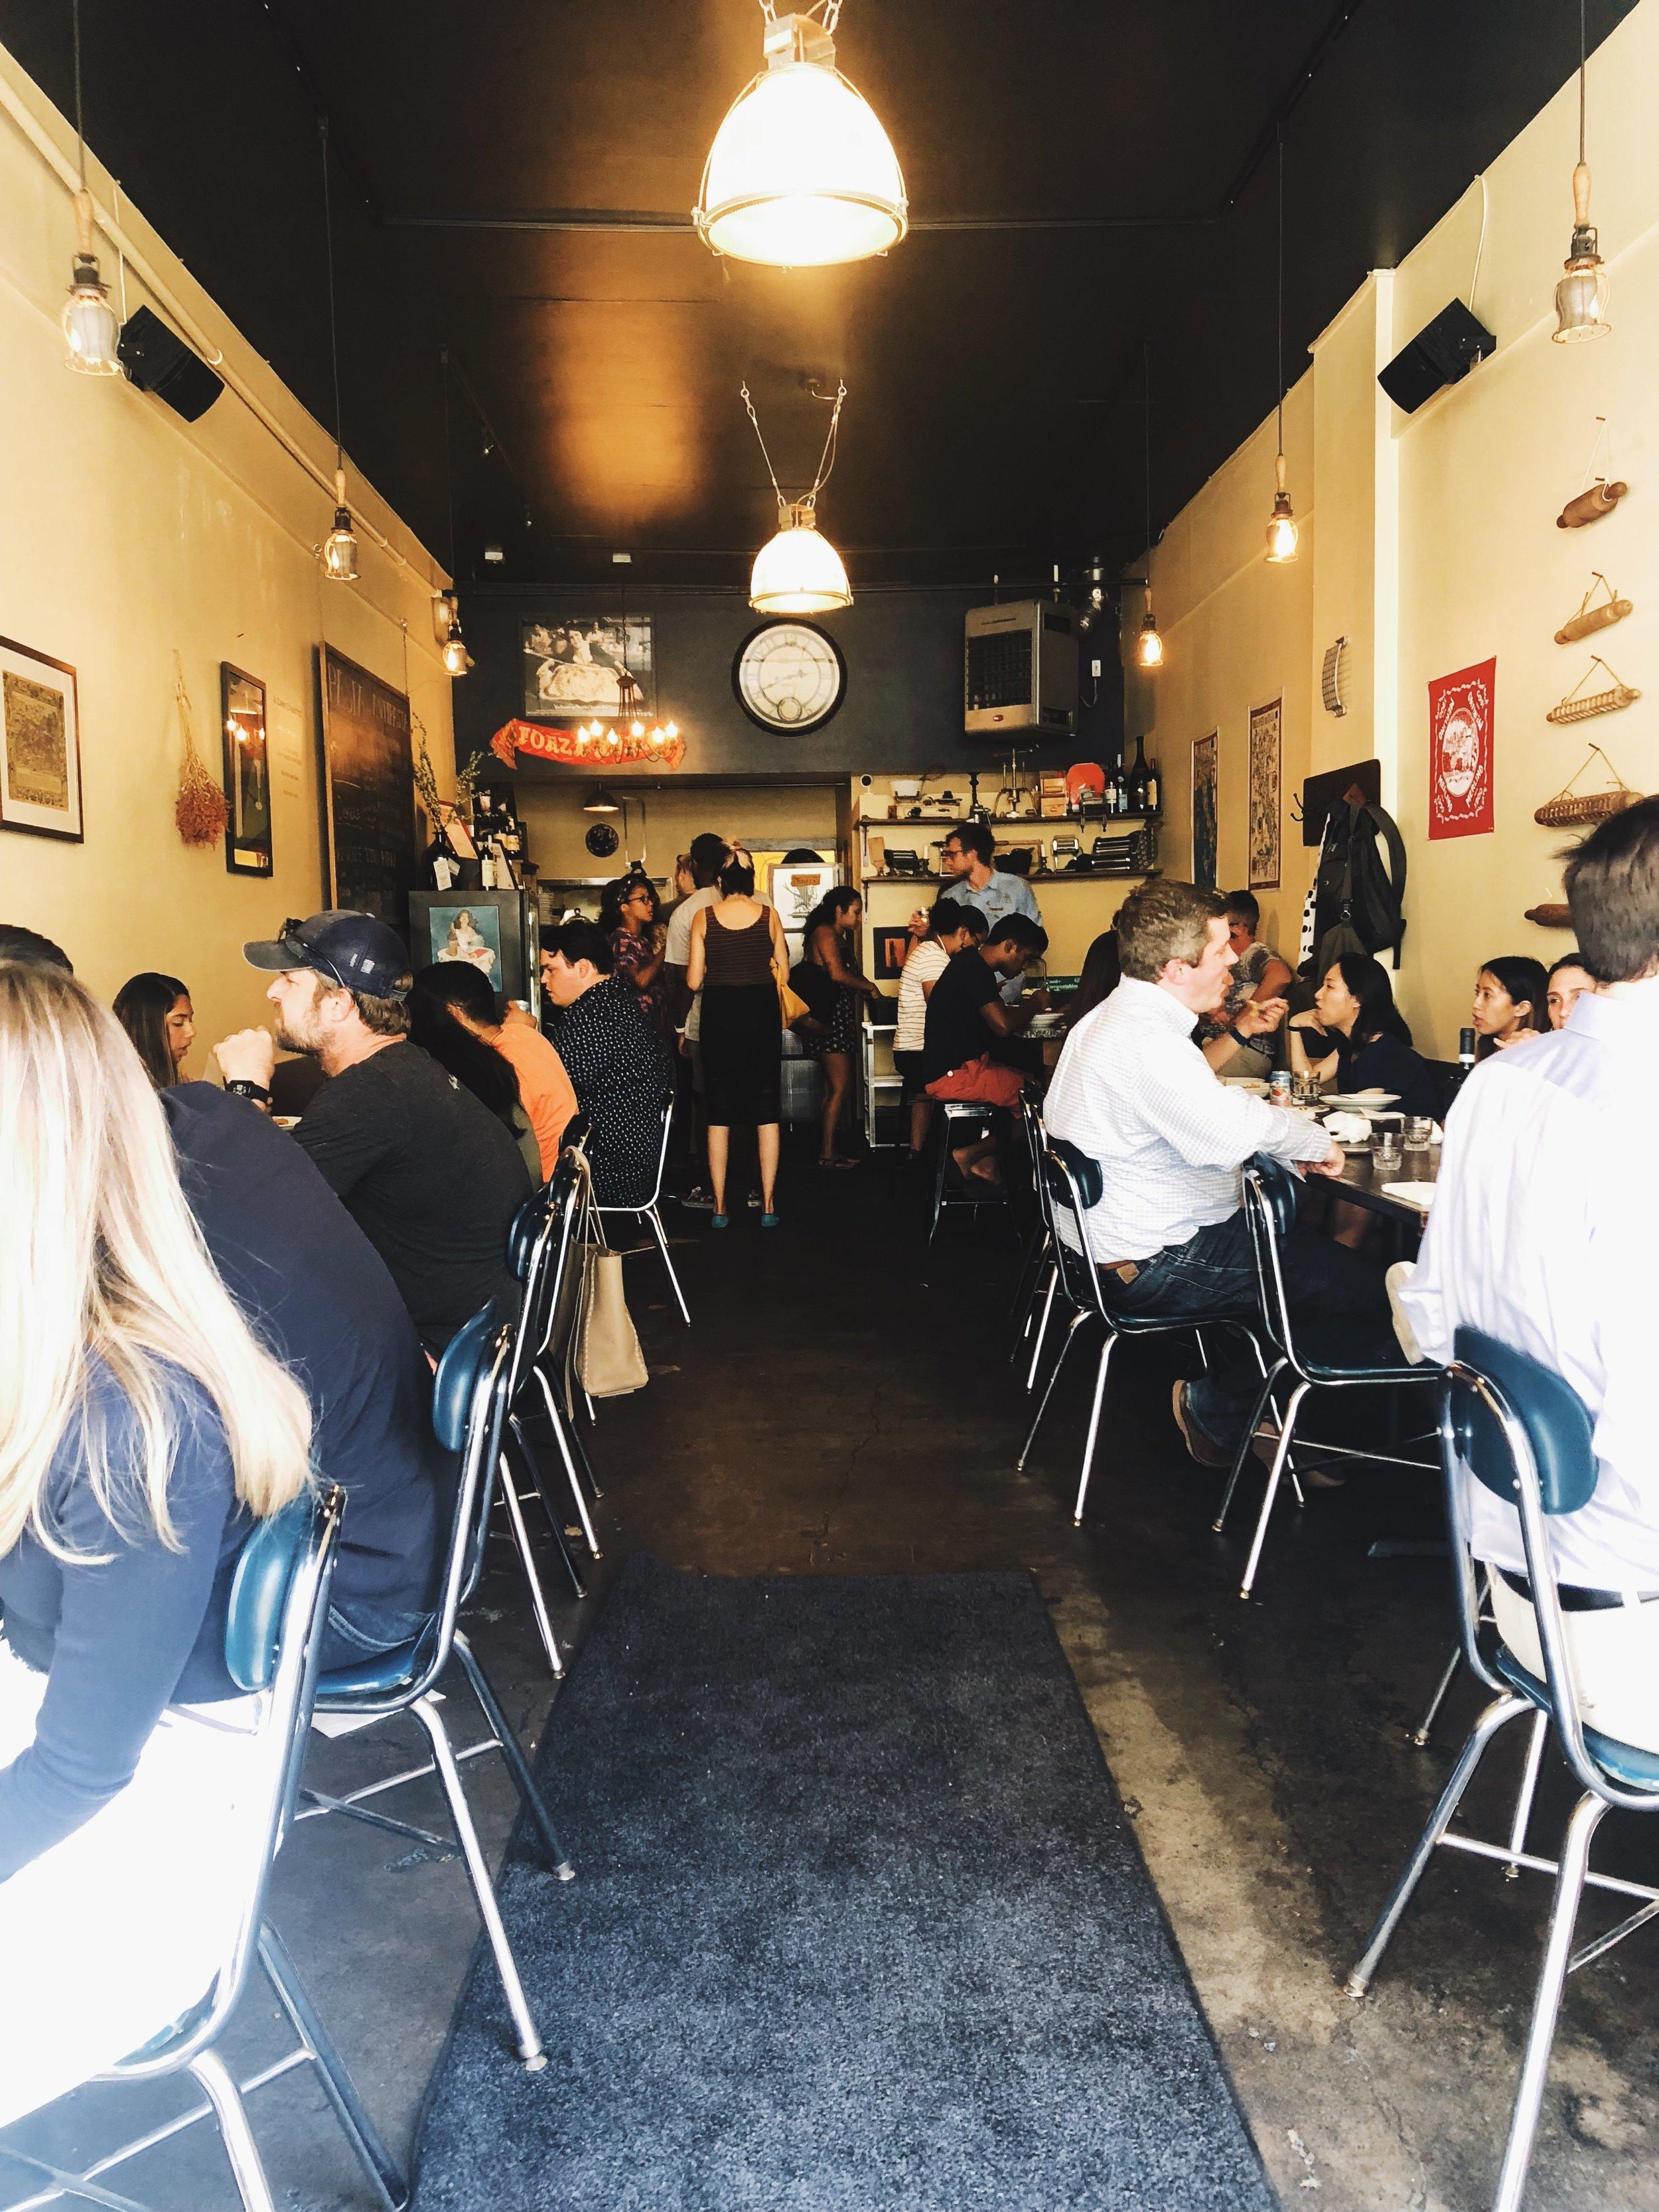 Il Corvo - Italian lunch spot